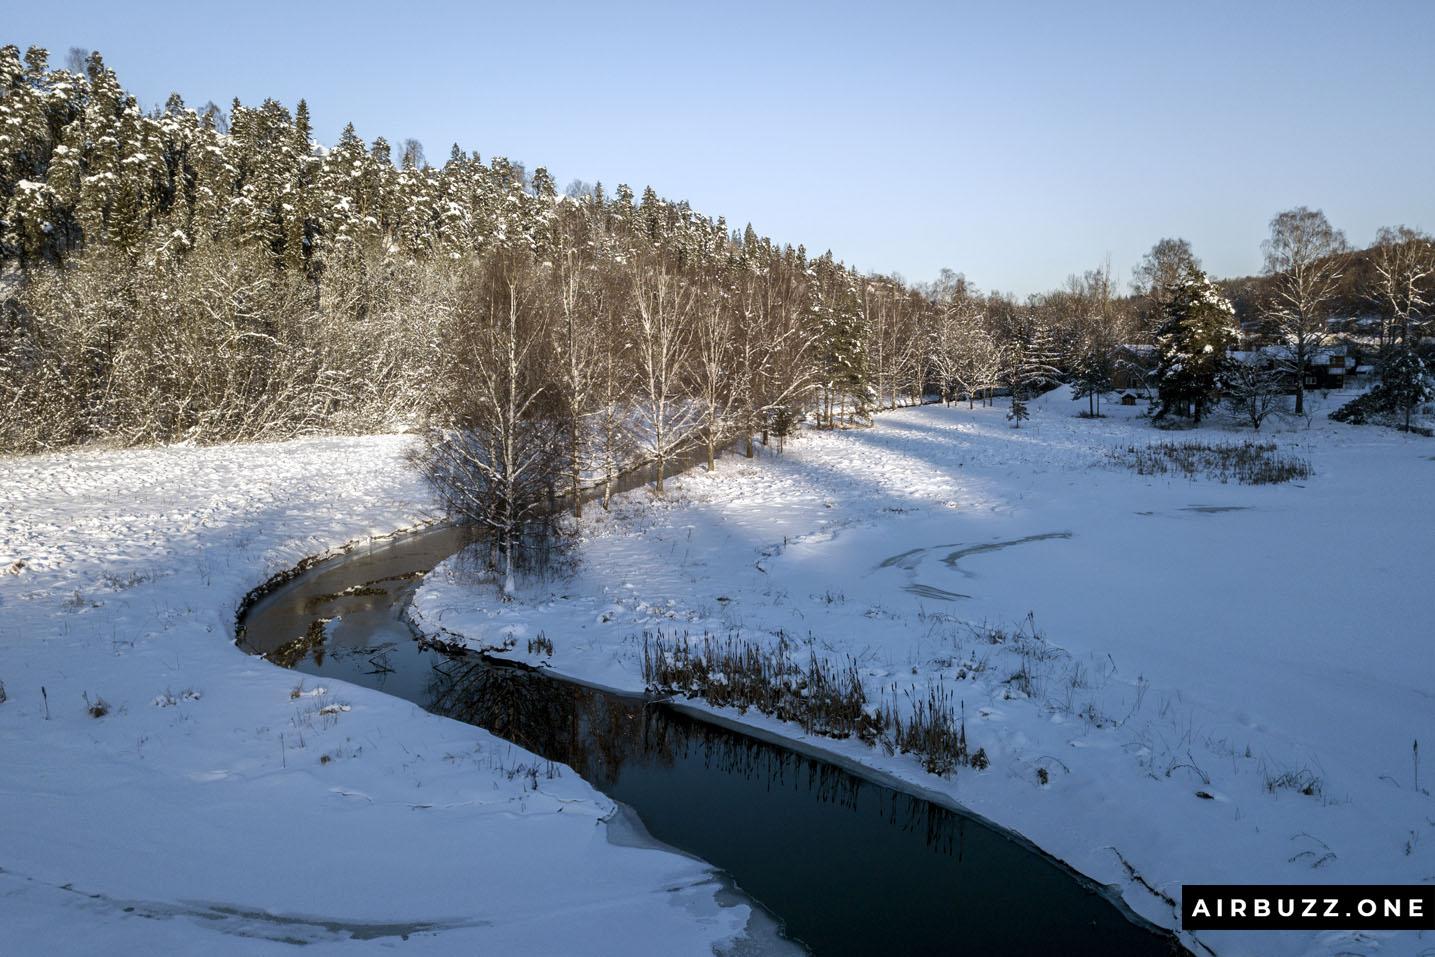 Snow, river, trees...